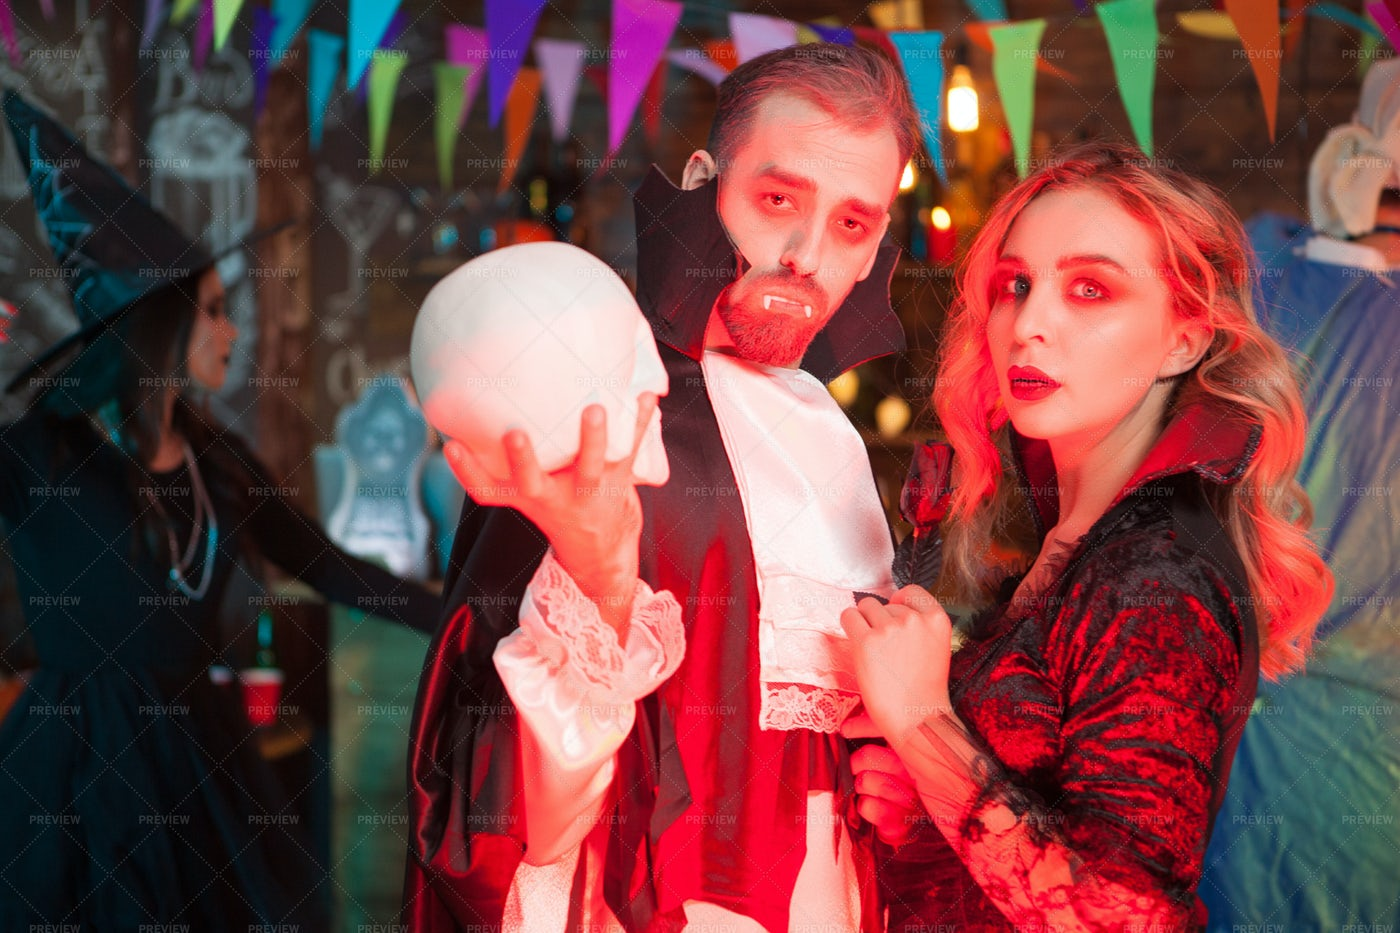 Playing Vampires: Stock Photos